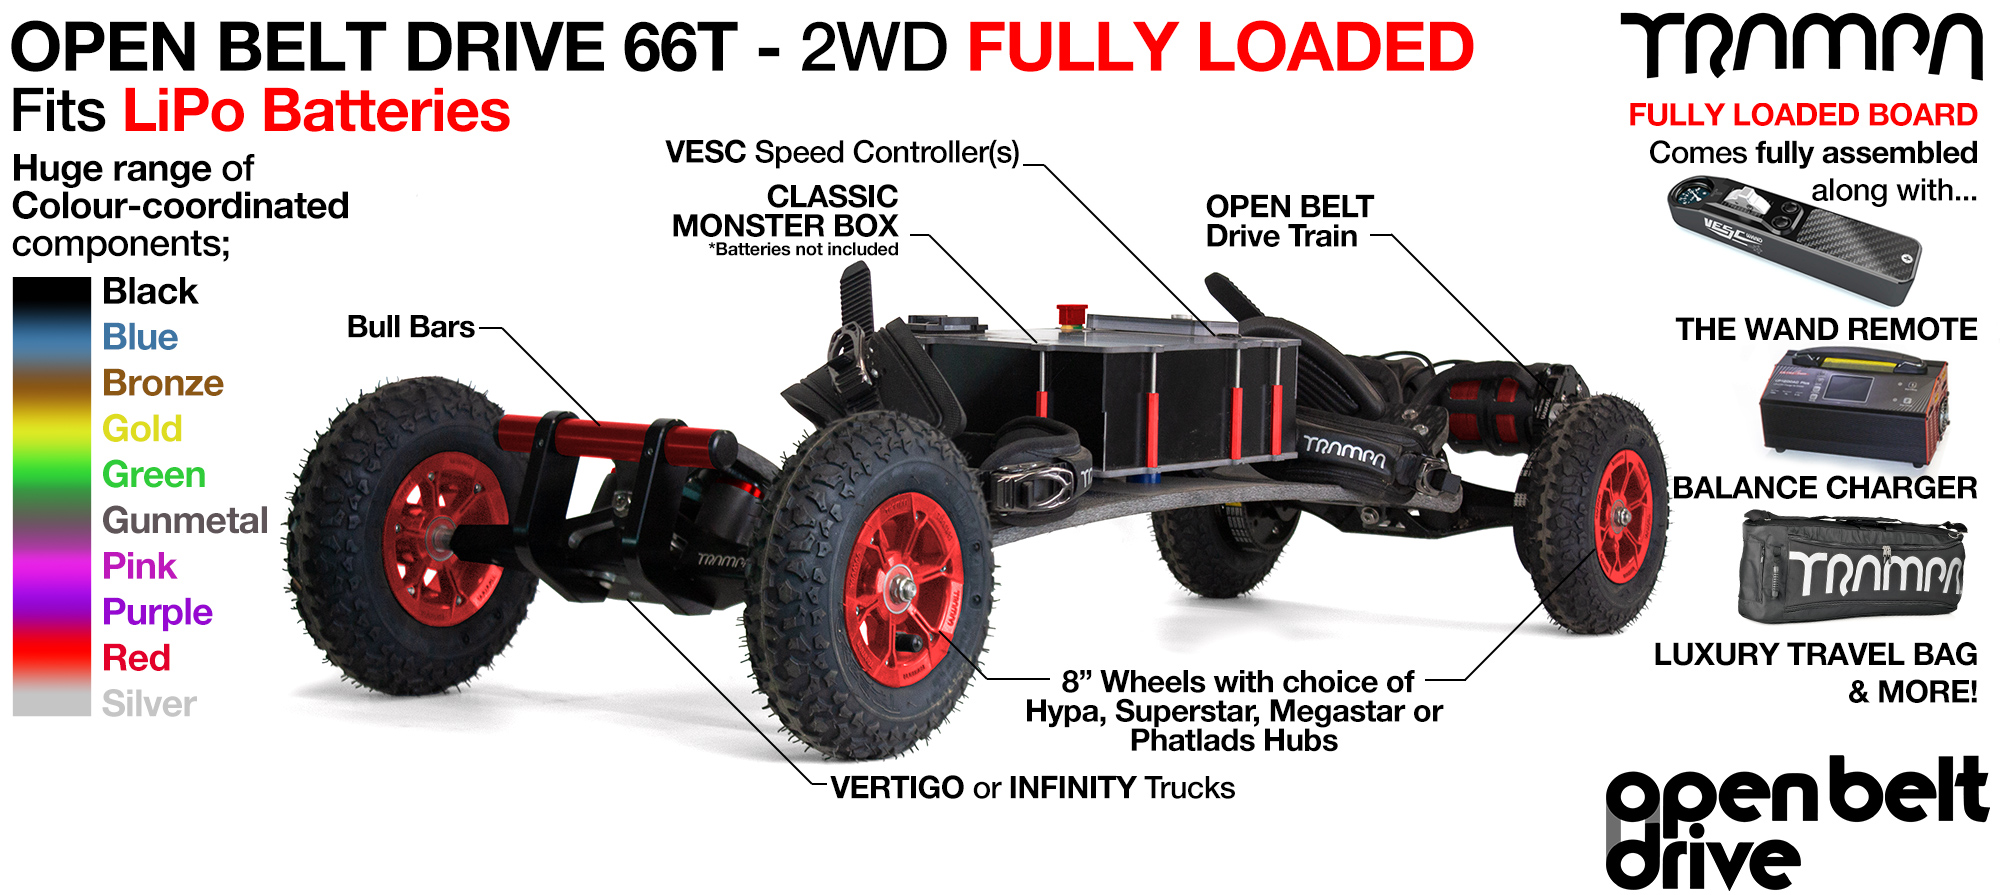 2WD 66T Open Belt Drive TRAMPA Electric Mountainboard with 8 Inch Wheels & 66 Tooth Pulleys - LOADED Li-Po